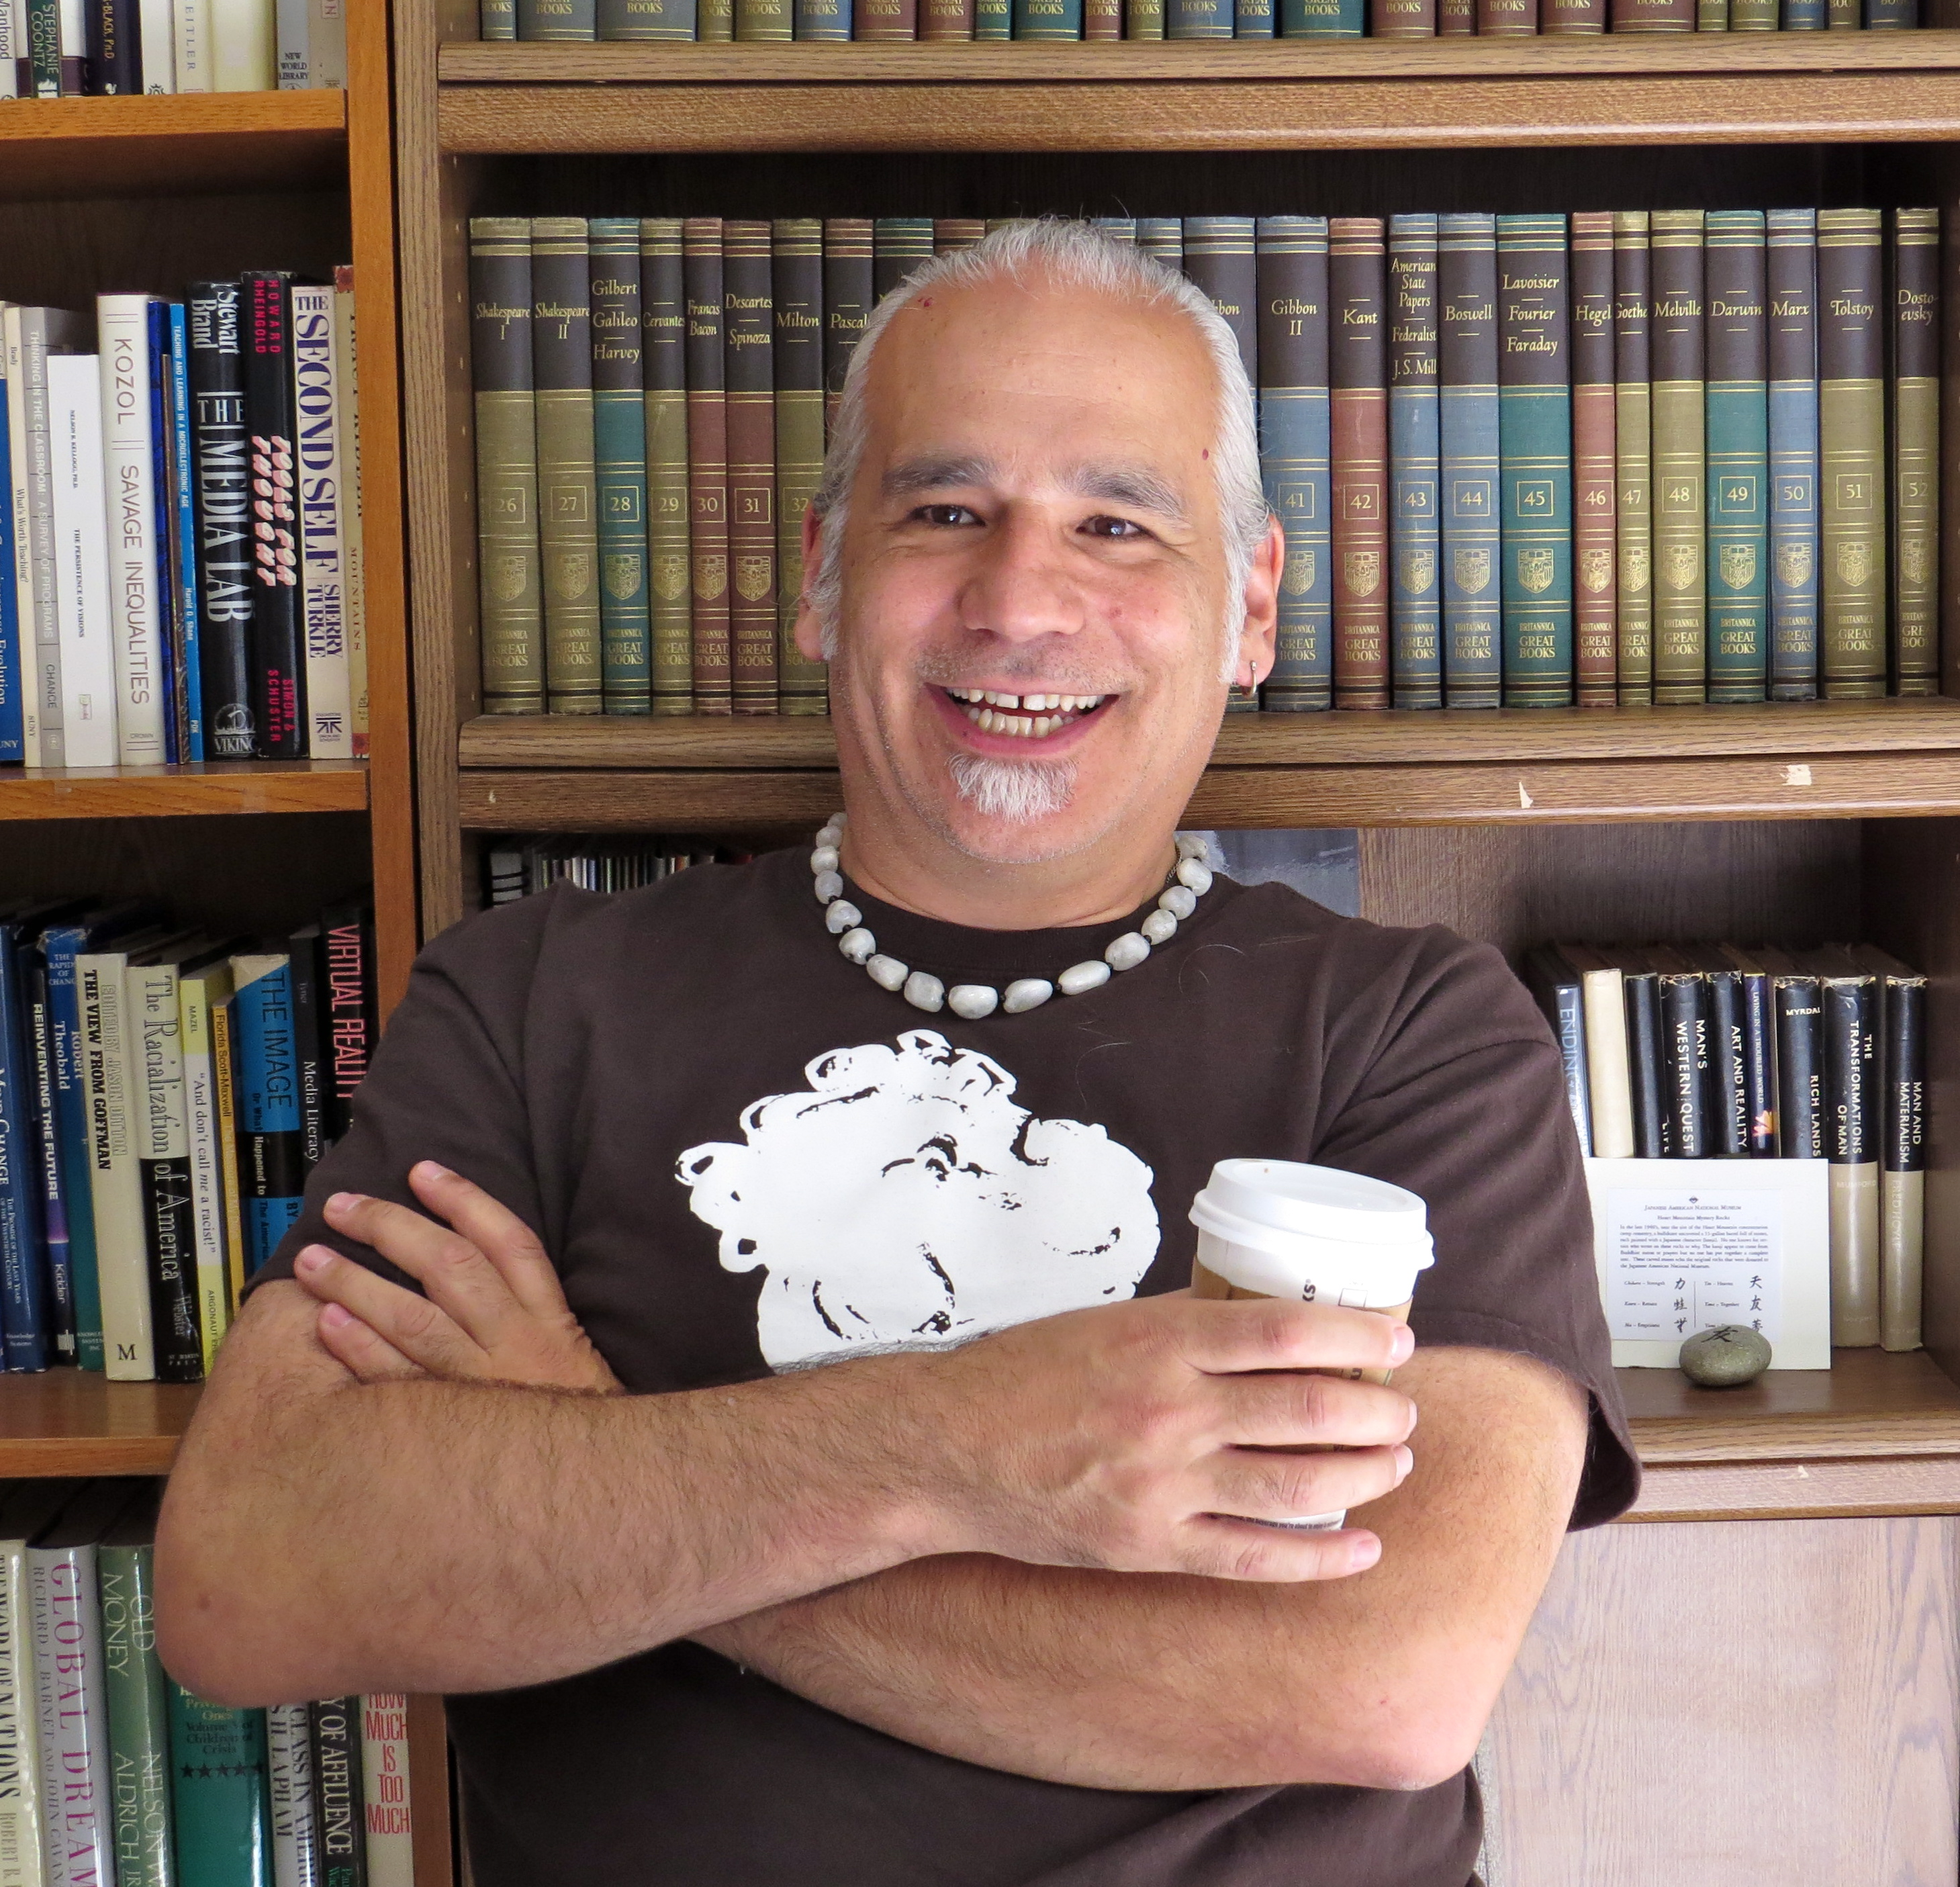 David Inocencio